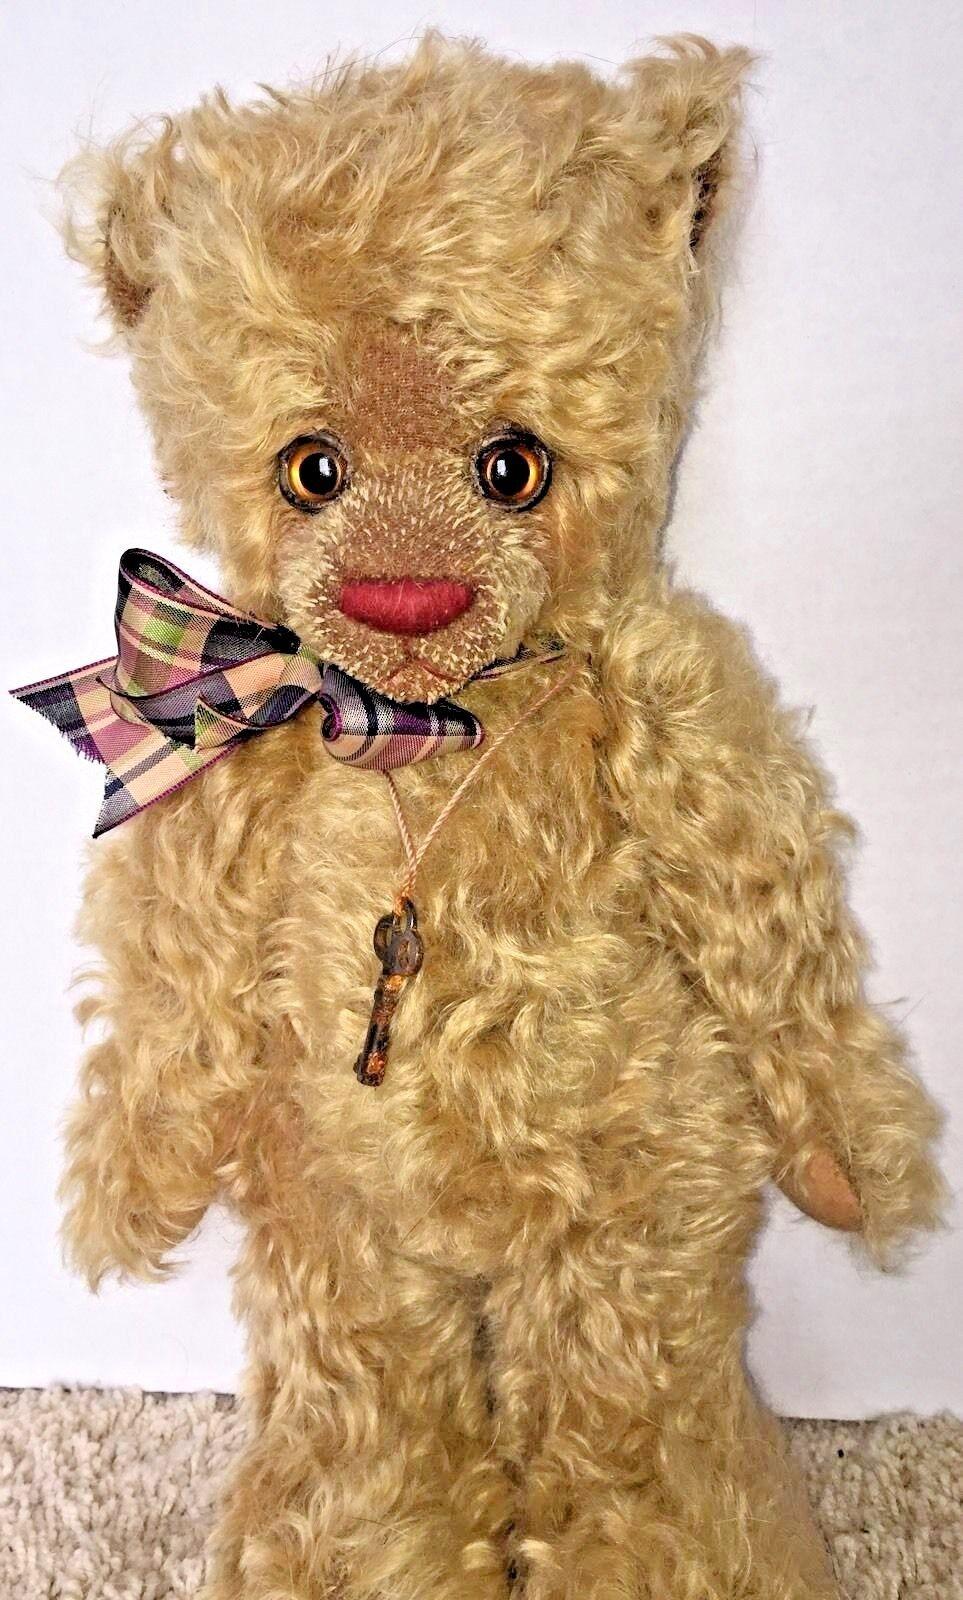 RARE Stunningly cute artist bear OOAK   Monroe  By Potbelly Bears 14   550